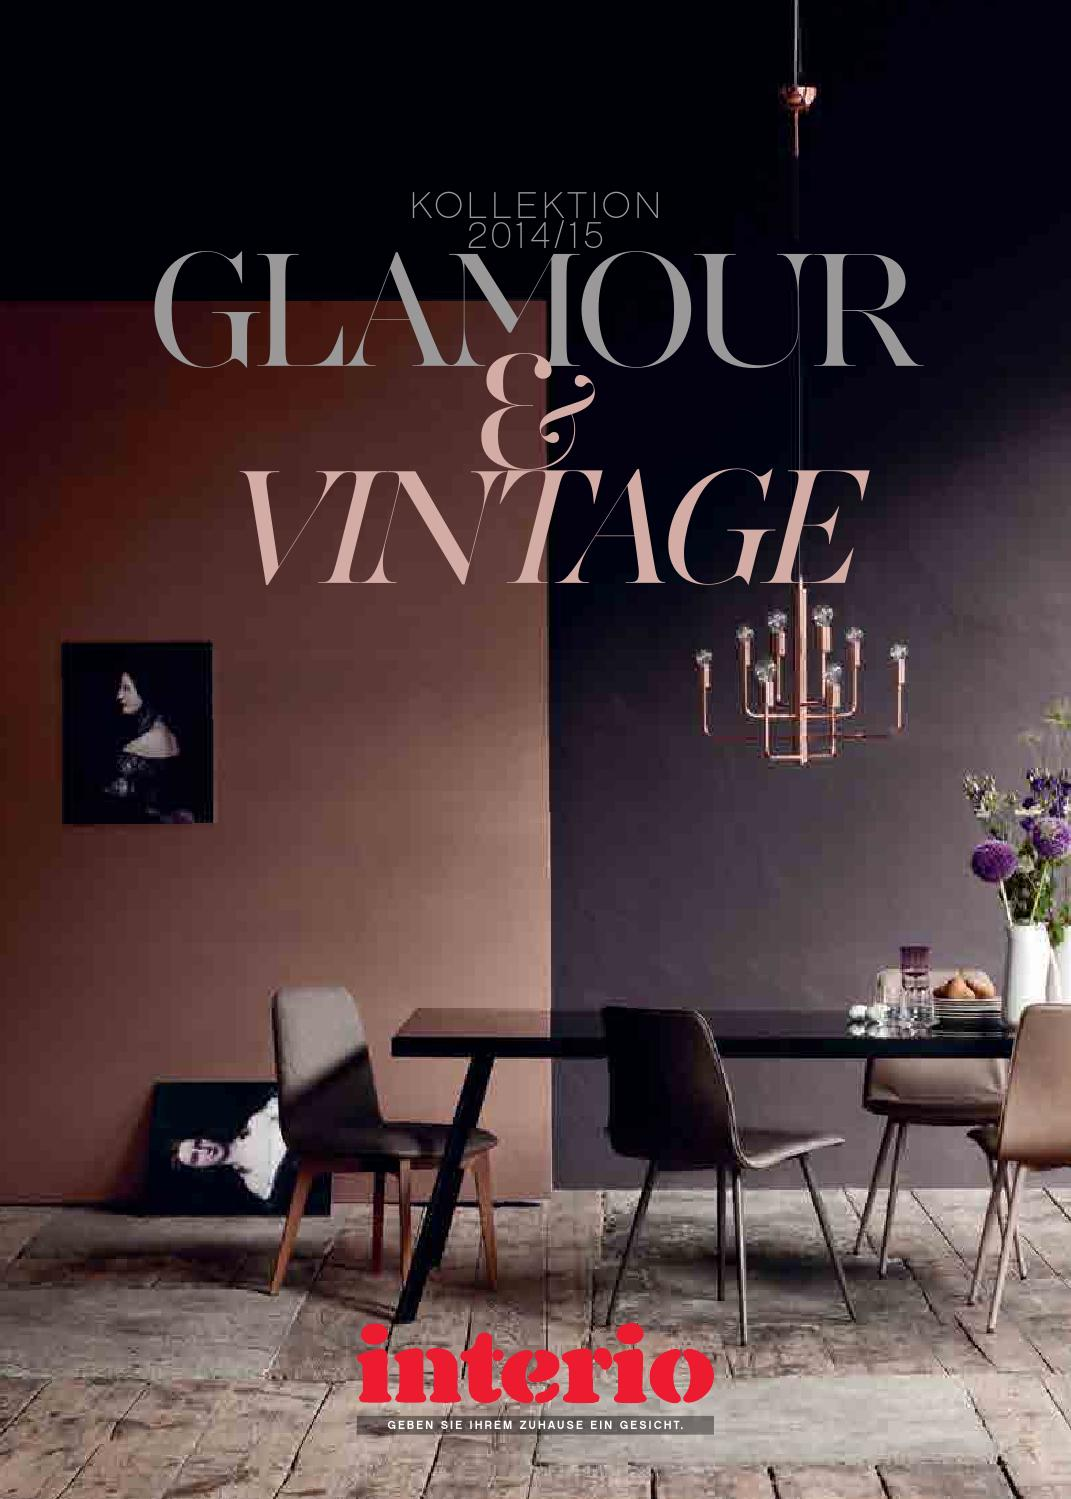 interio katalog by interio sterreich issuu. Black Bedroom Furniture Sets. Home Design Ideas